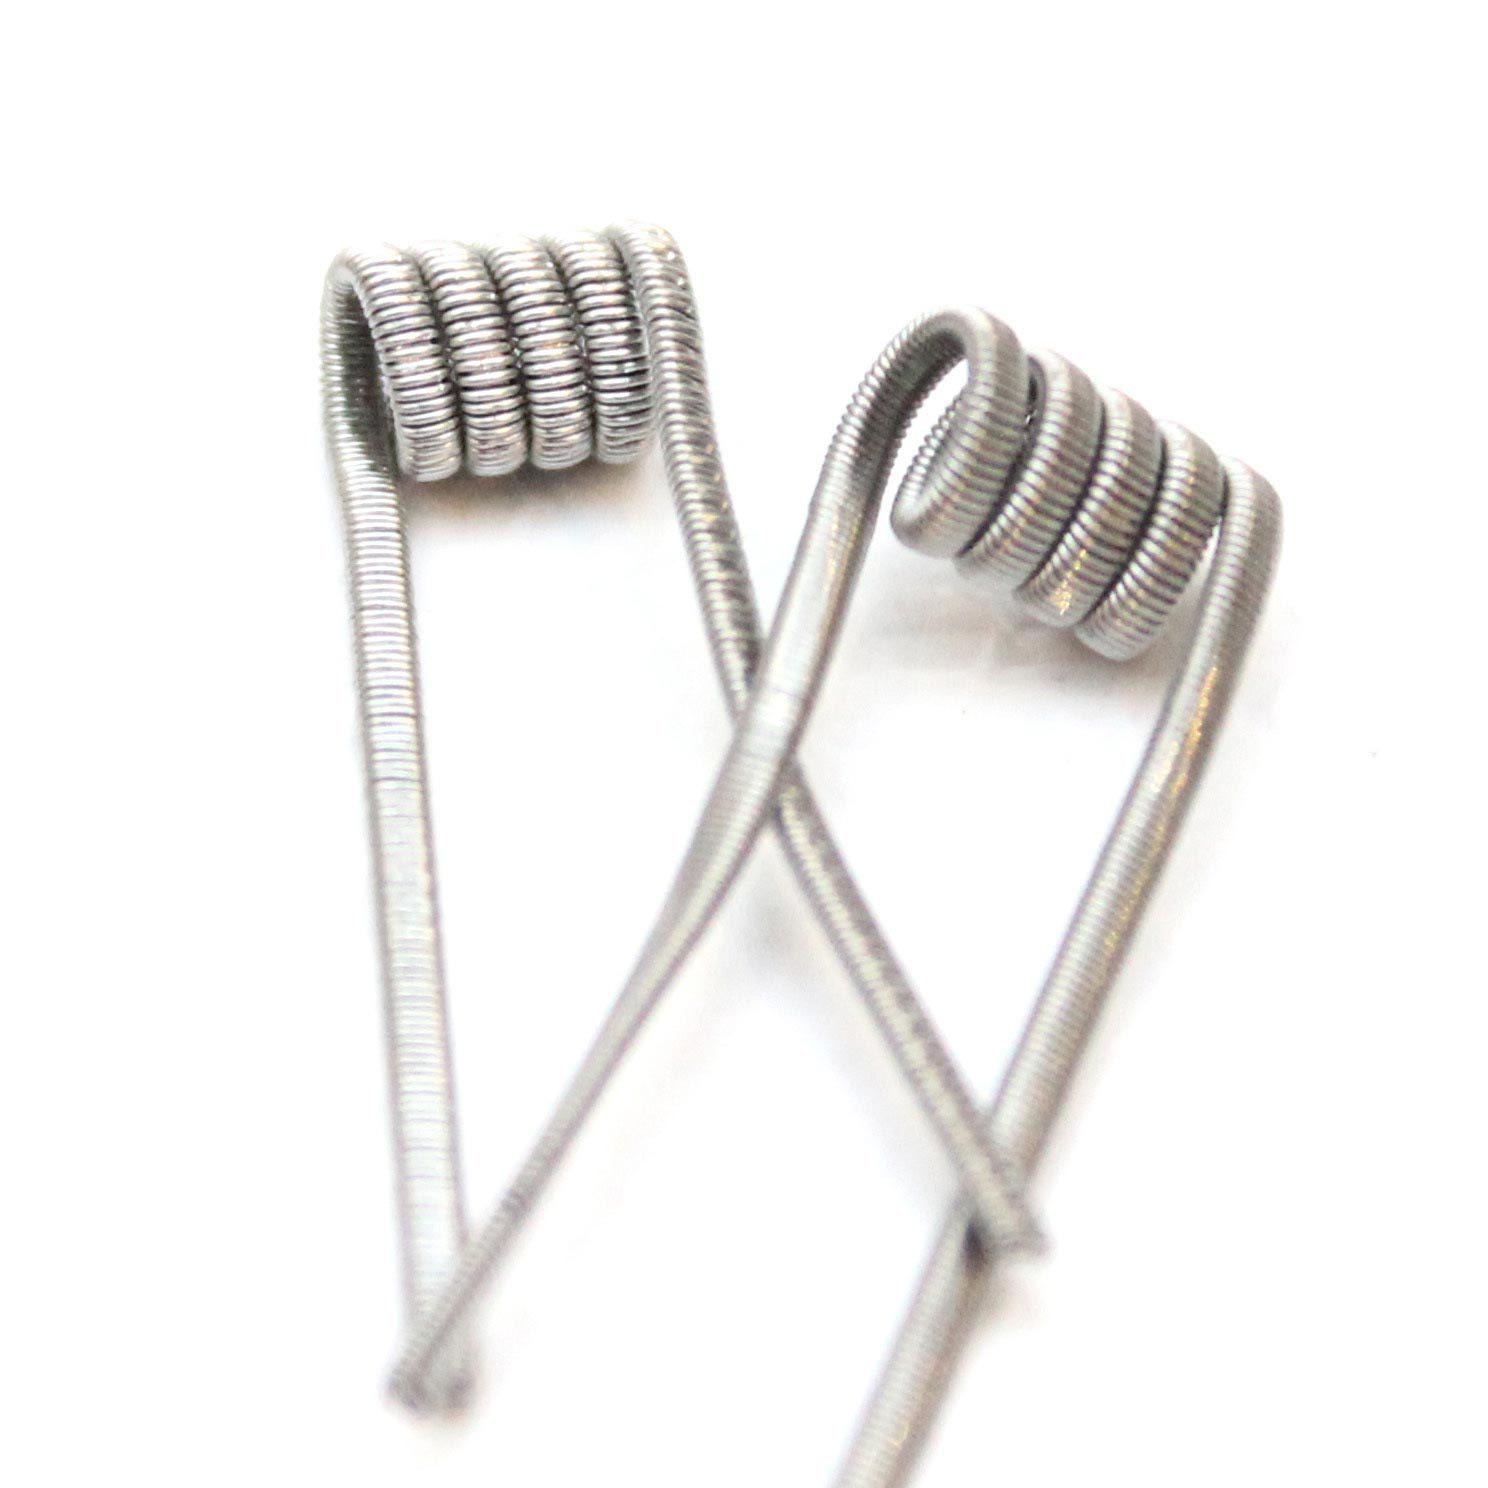 Prebuild Alien (flat clapton) coil 0.45